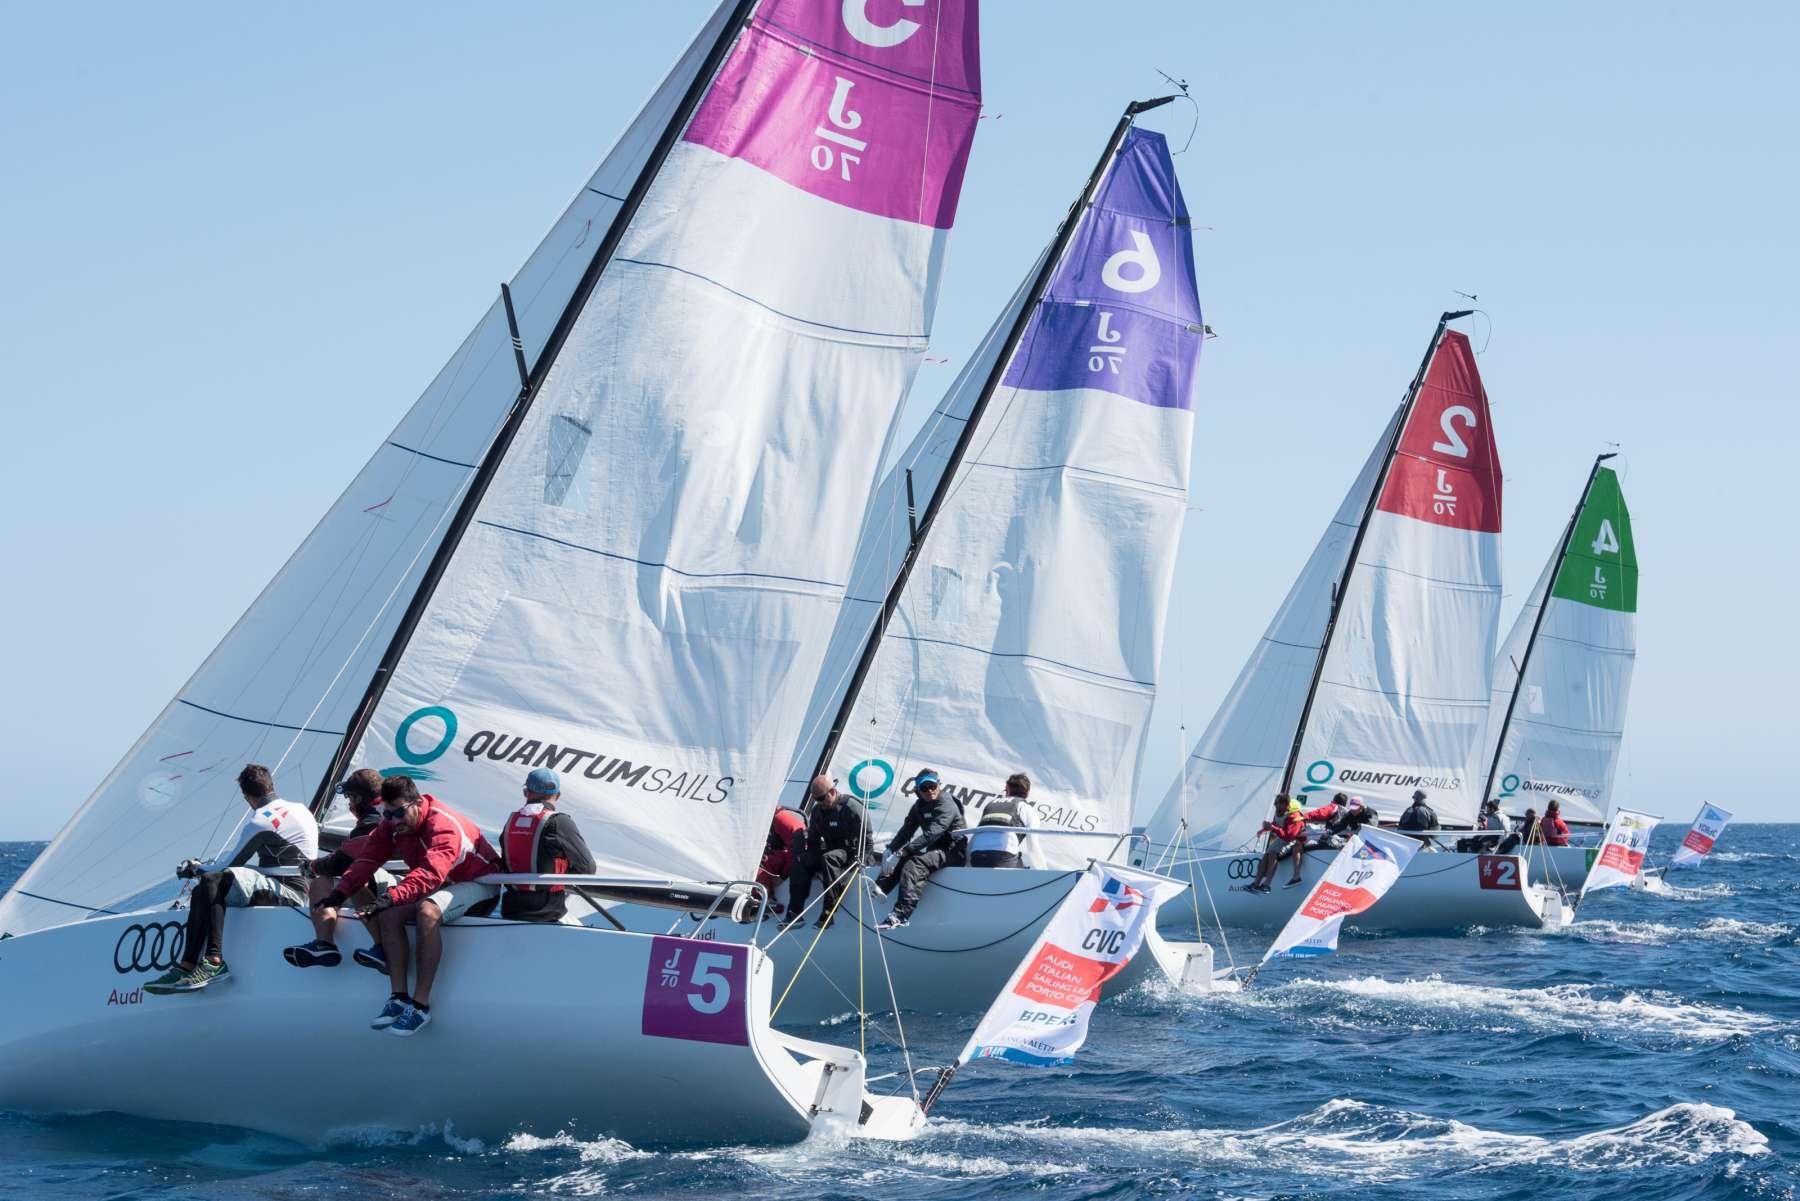 Audi Italian Sailing League Final gets underway - NEWS - Yacht Club Costa Smeralda